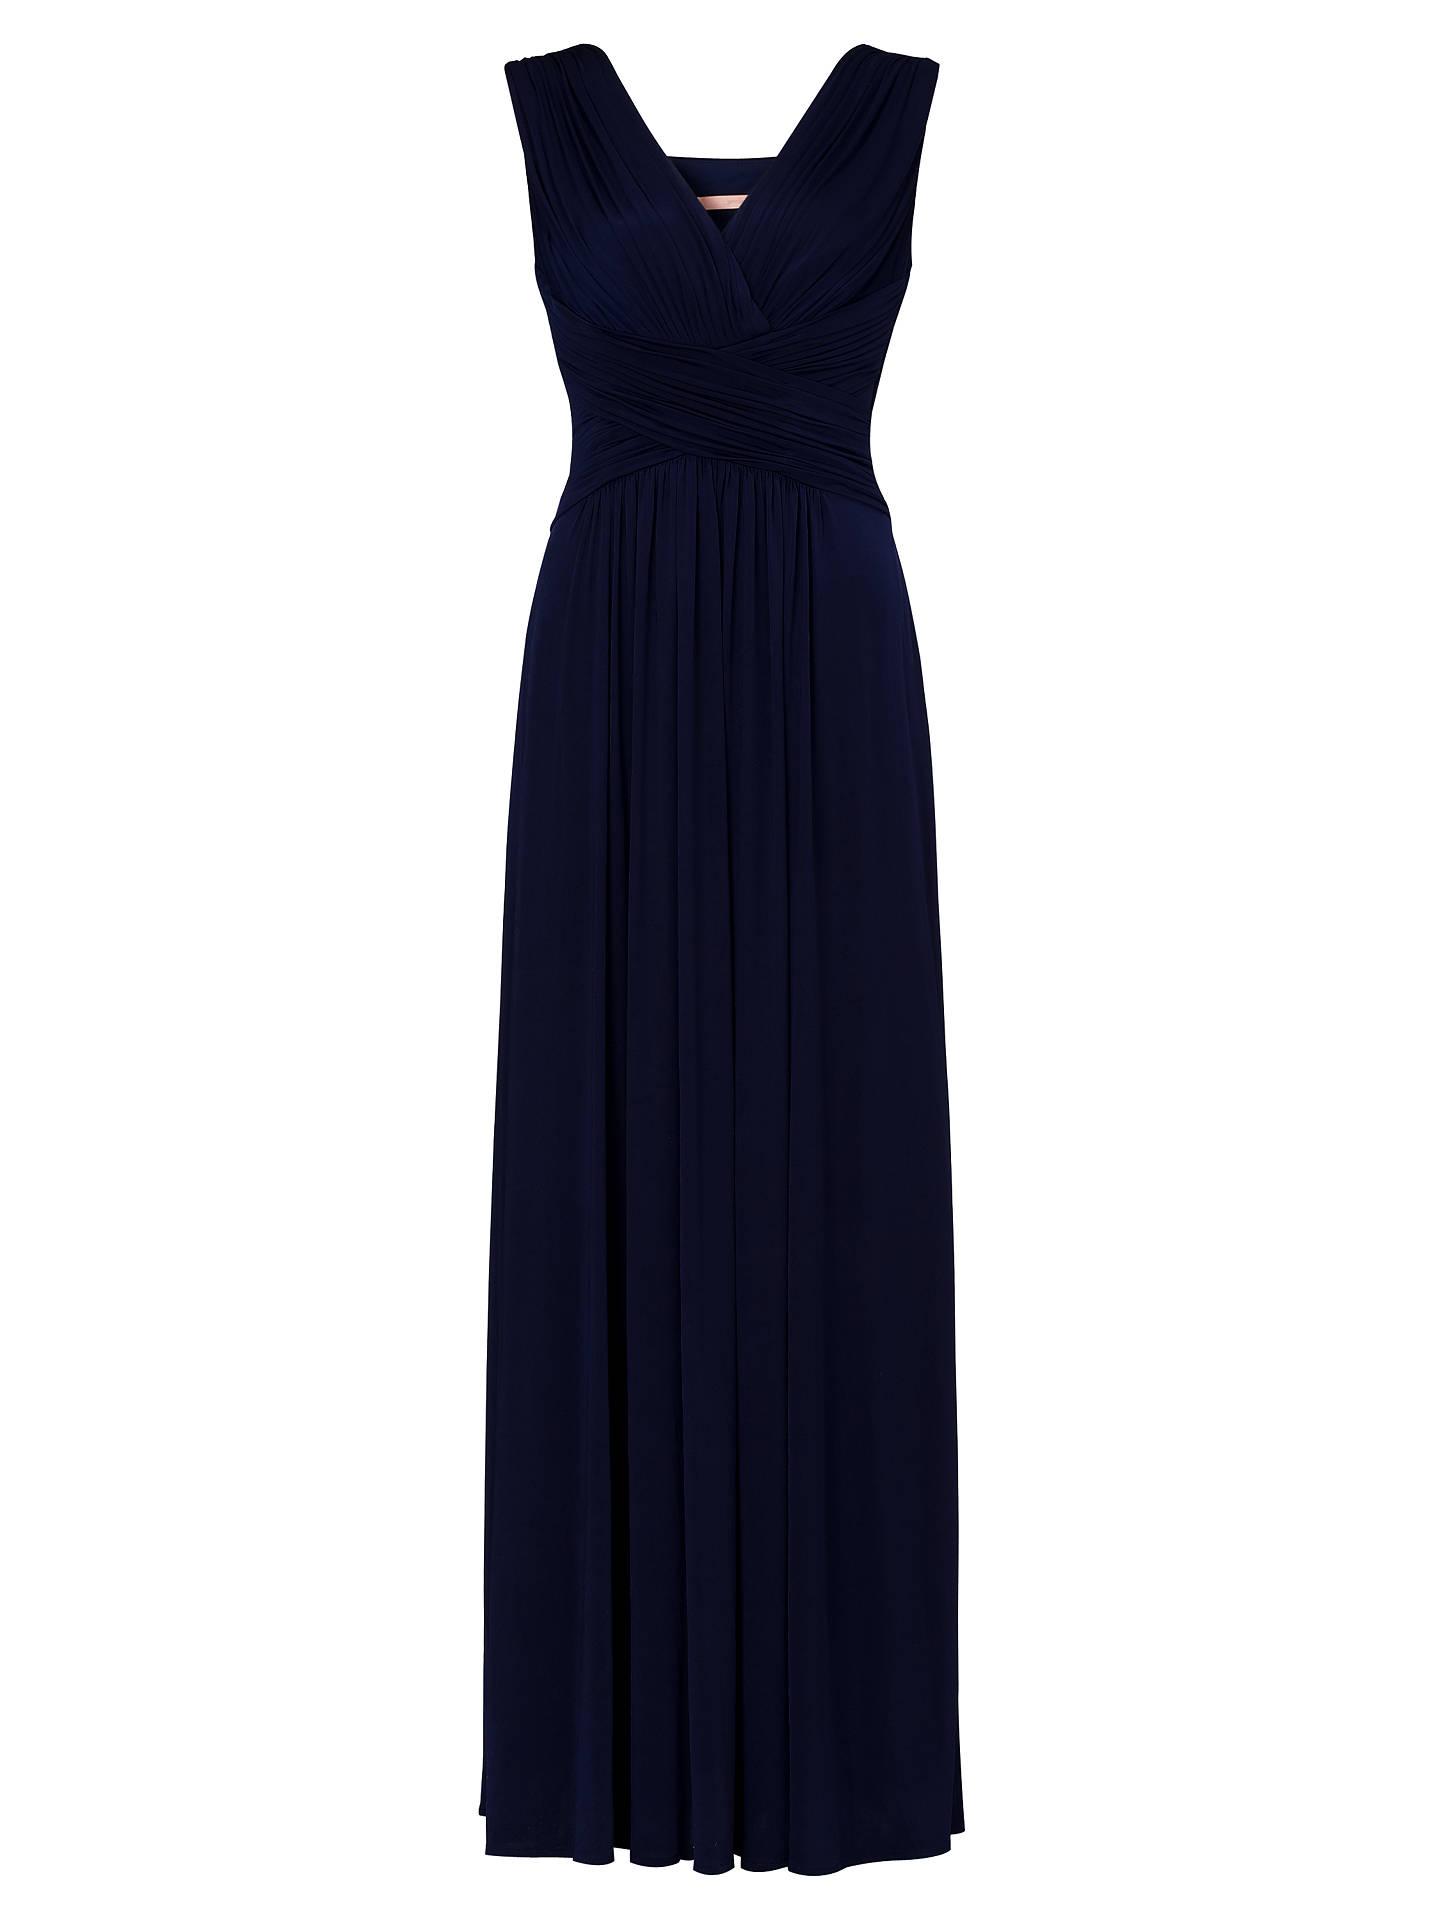 7a9defaa67bd9 Buy John Lewis Frances Jersey Maxi Dress, Midnight, 8 Online at  johnlewis.com ...